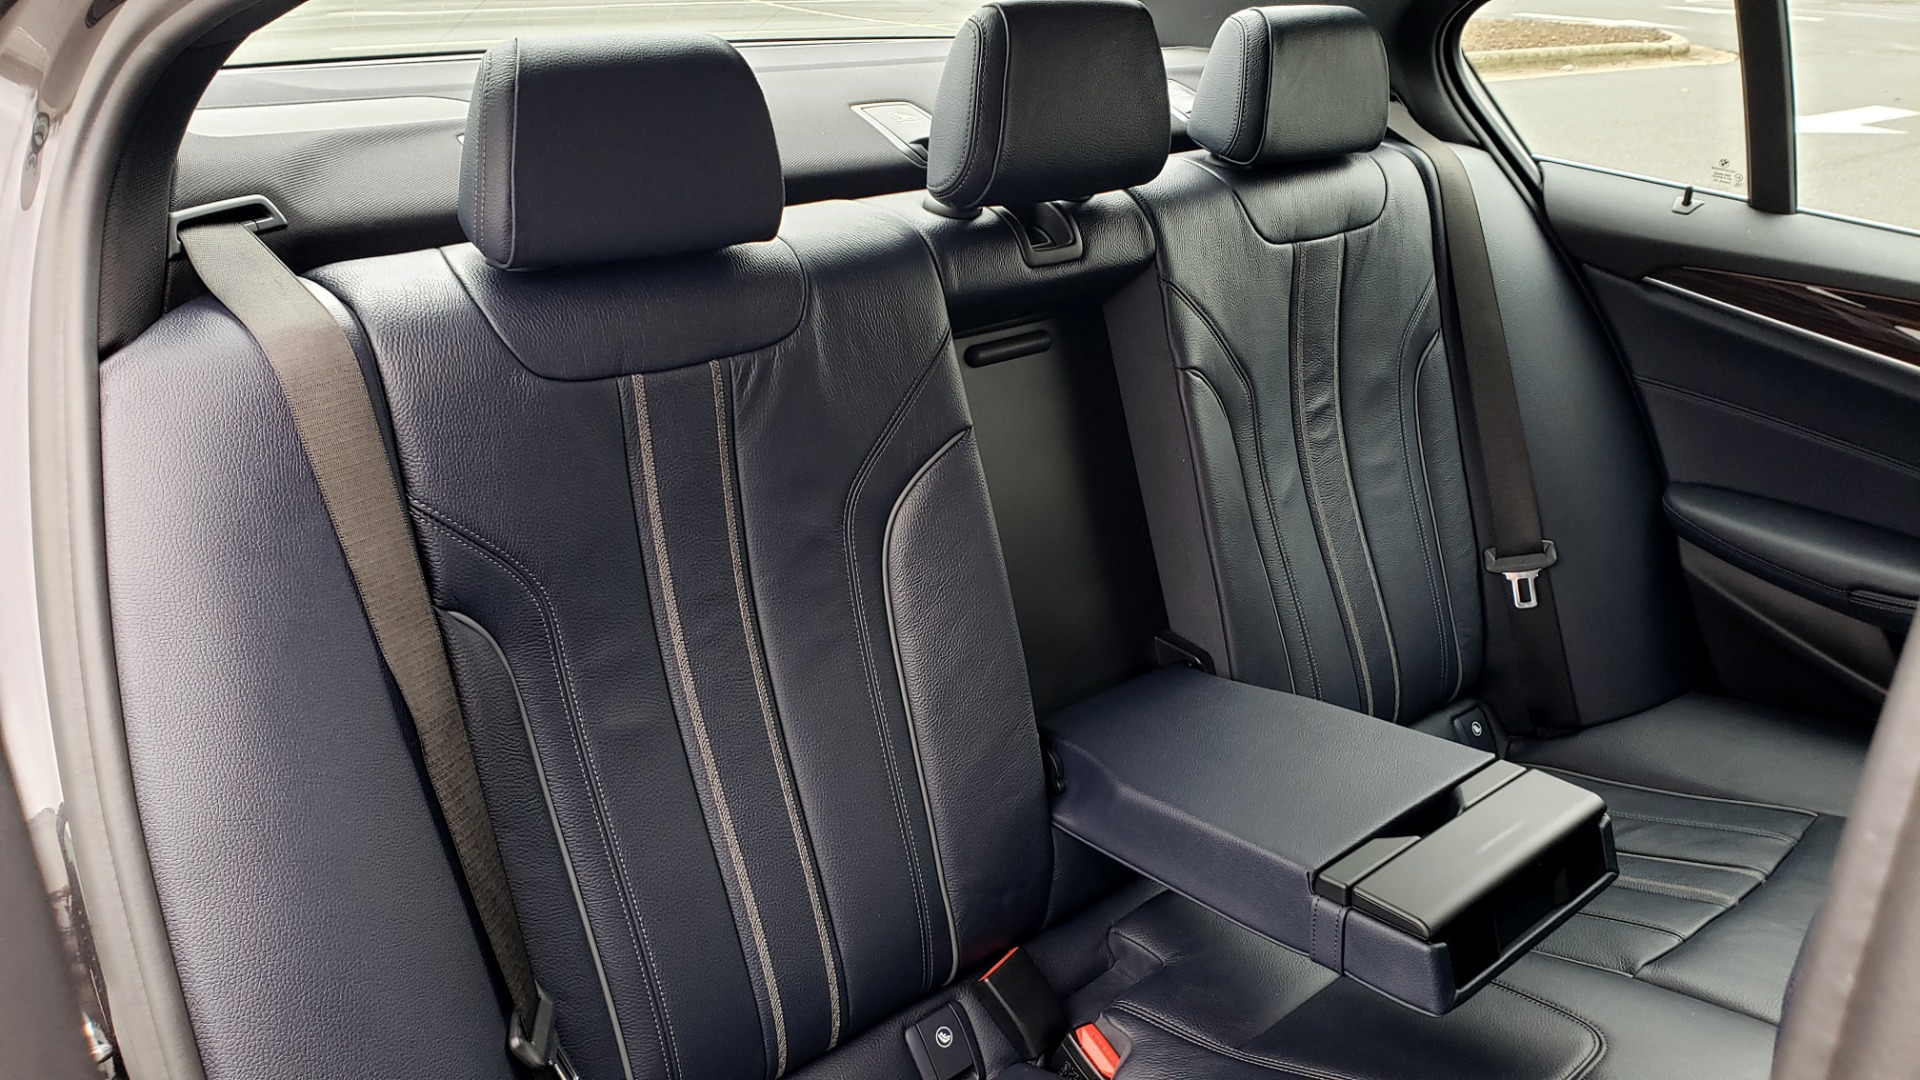 Used 2017 BMW 5 SERIES 530IXDRIVE / PREM PKG / DRVR ASST PLUS / CLD WTHR / APPLE CARPLAY for sale Sold at Formula Imports in Charlotte NC 28227 72